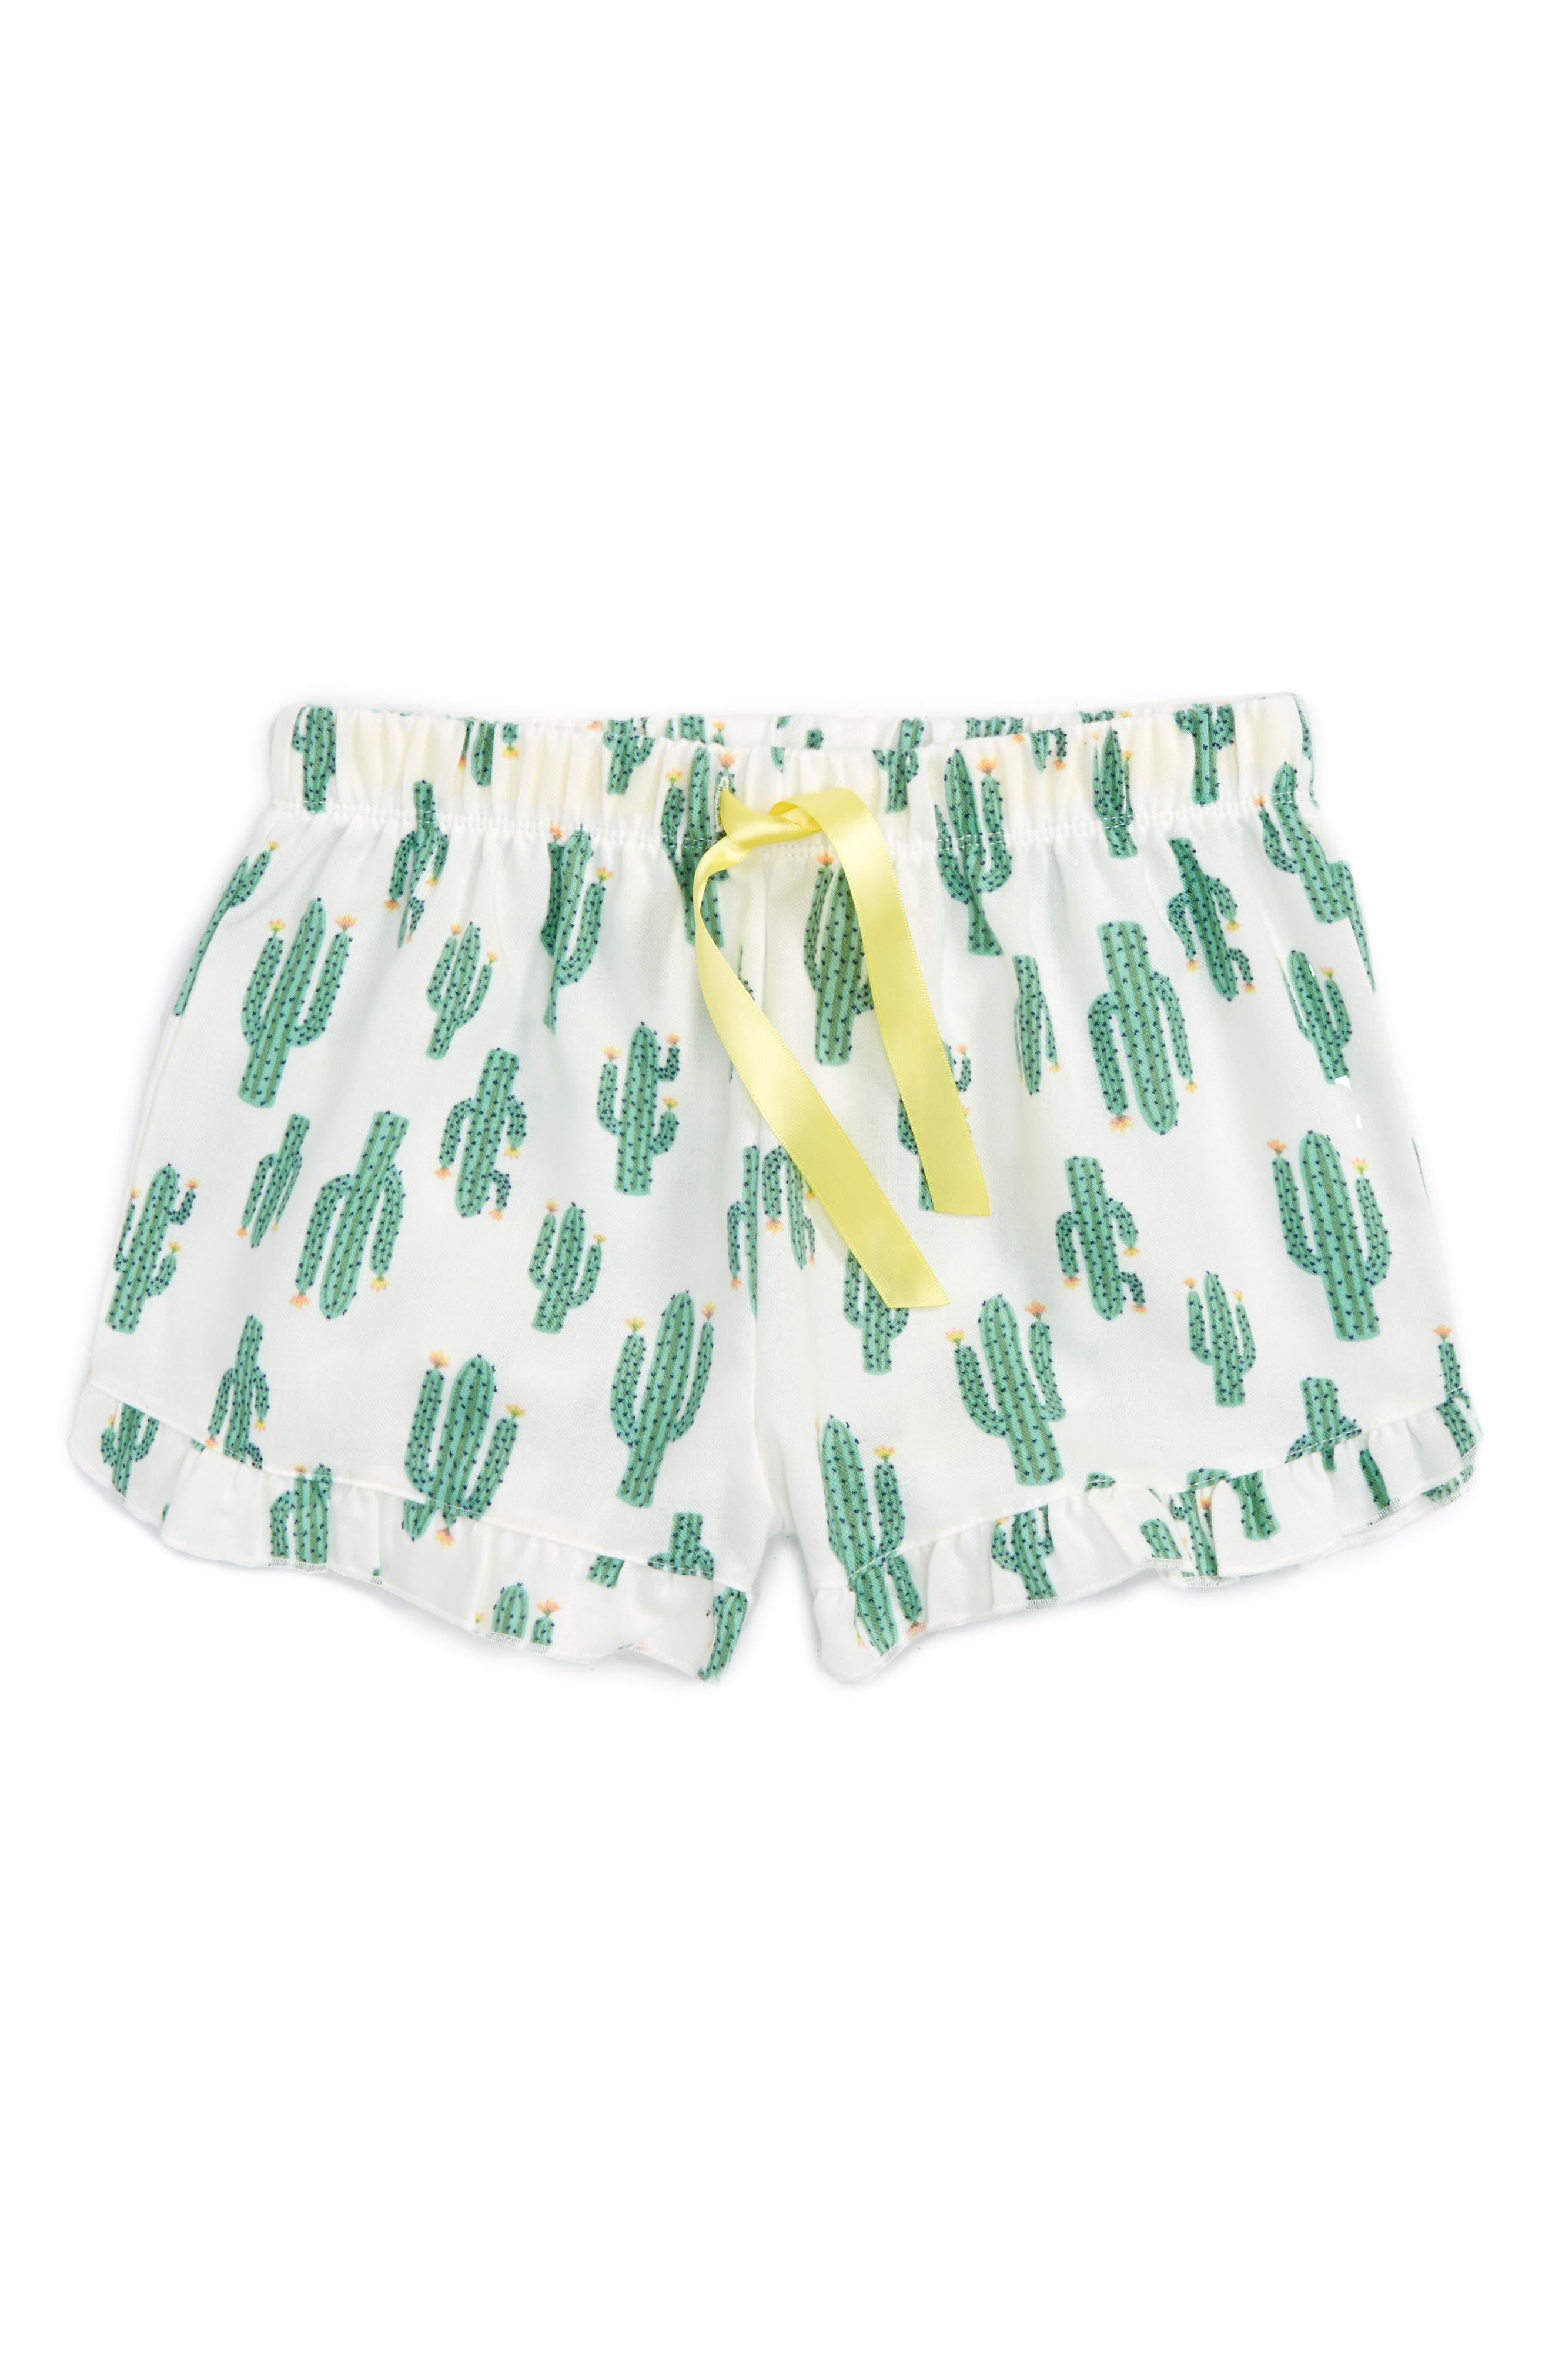 Flannel Shorts,                         Main,                         color, Ivory Egret Cactus